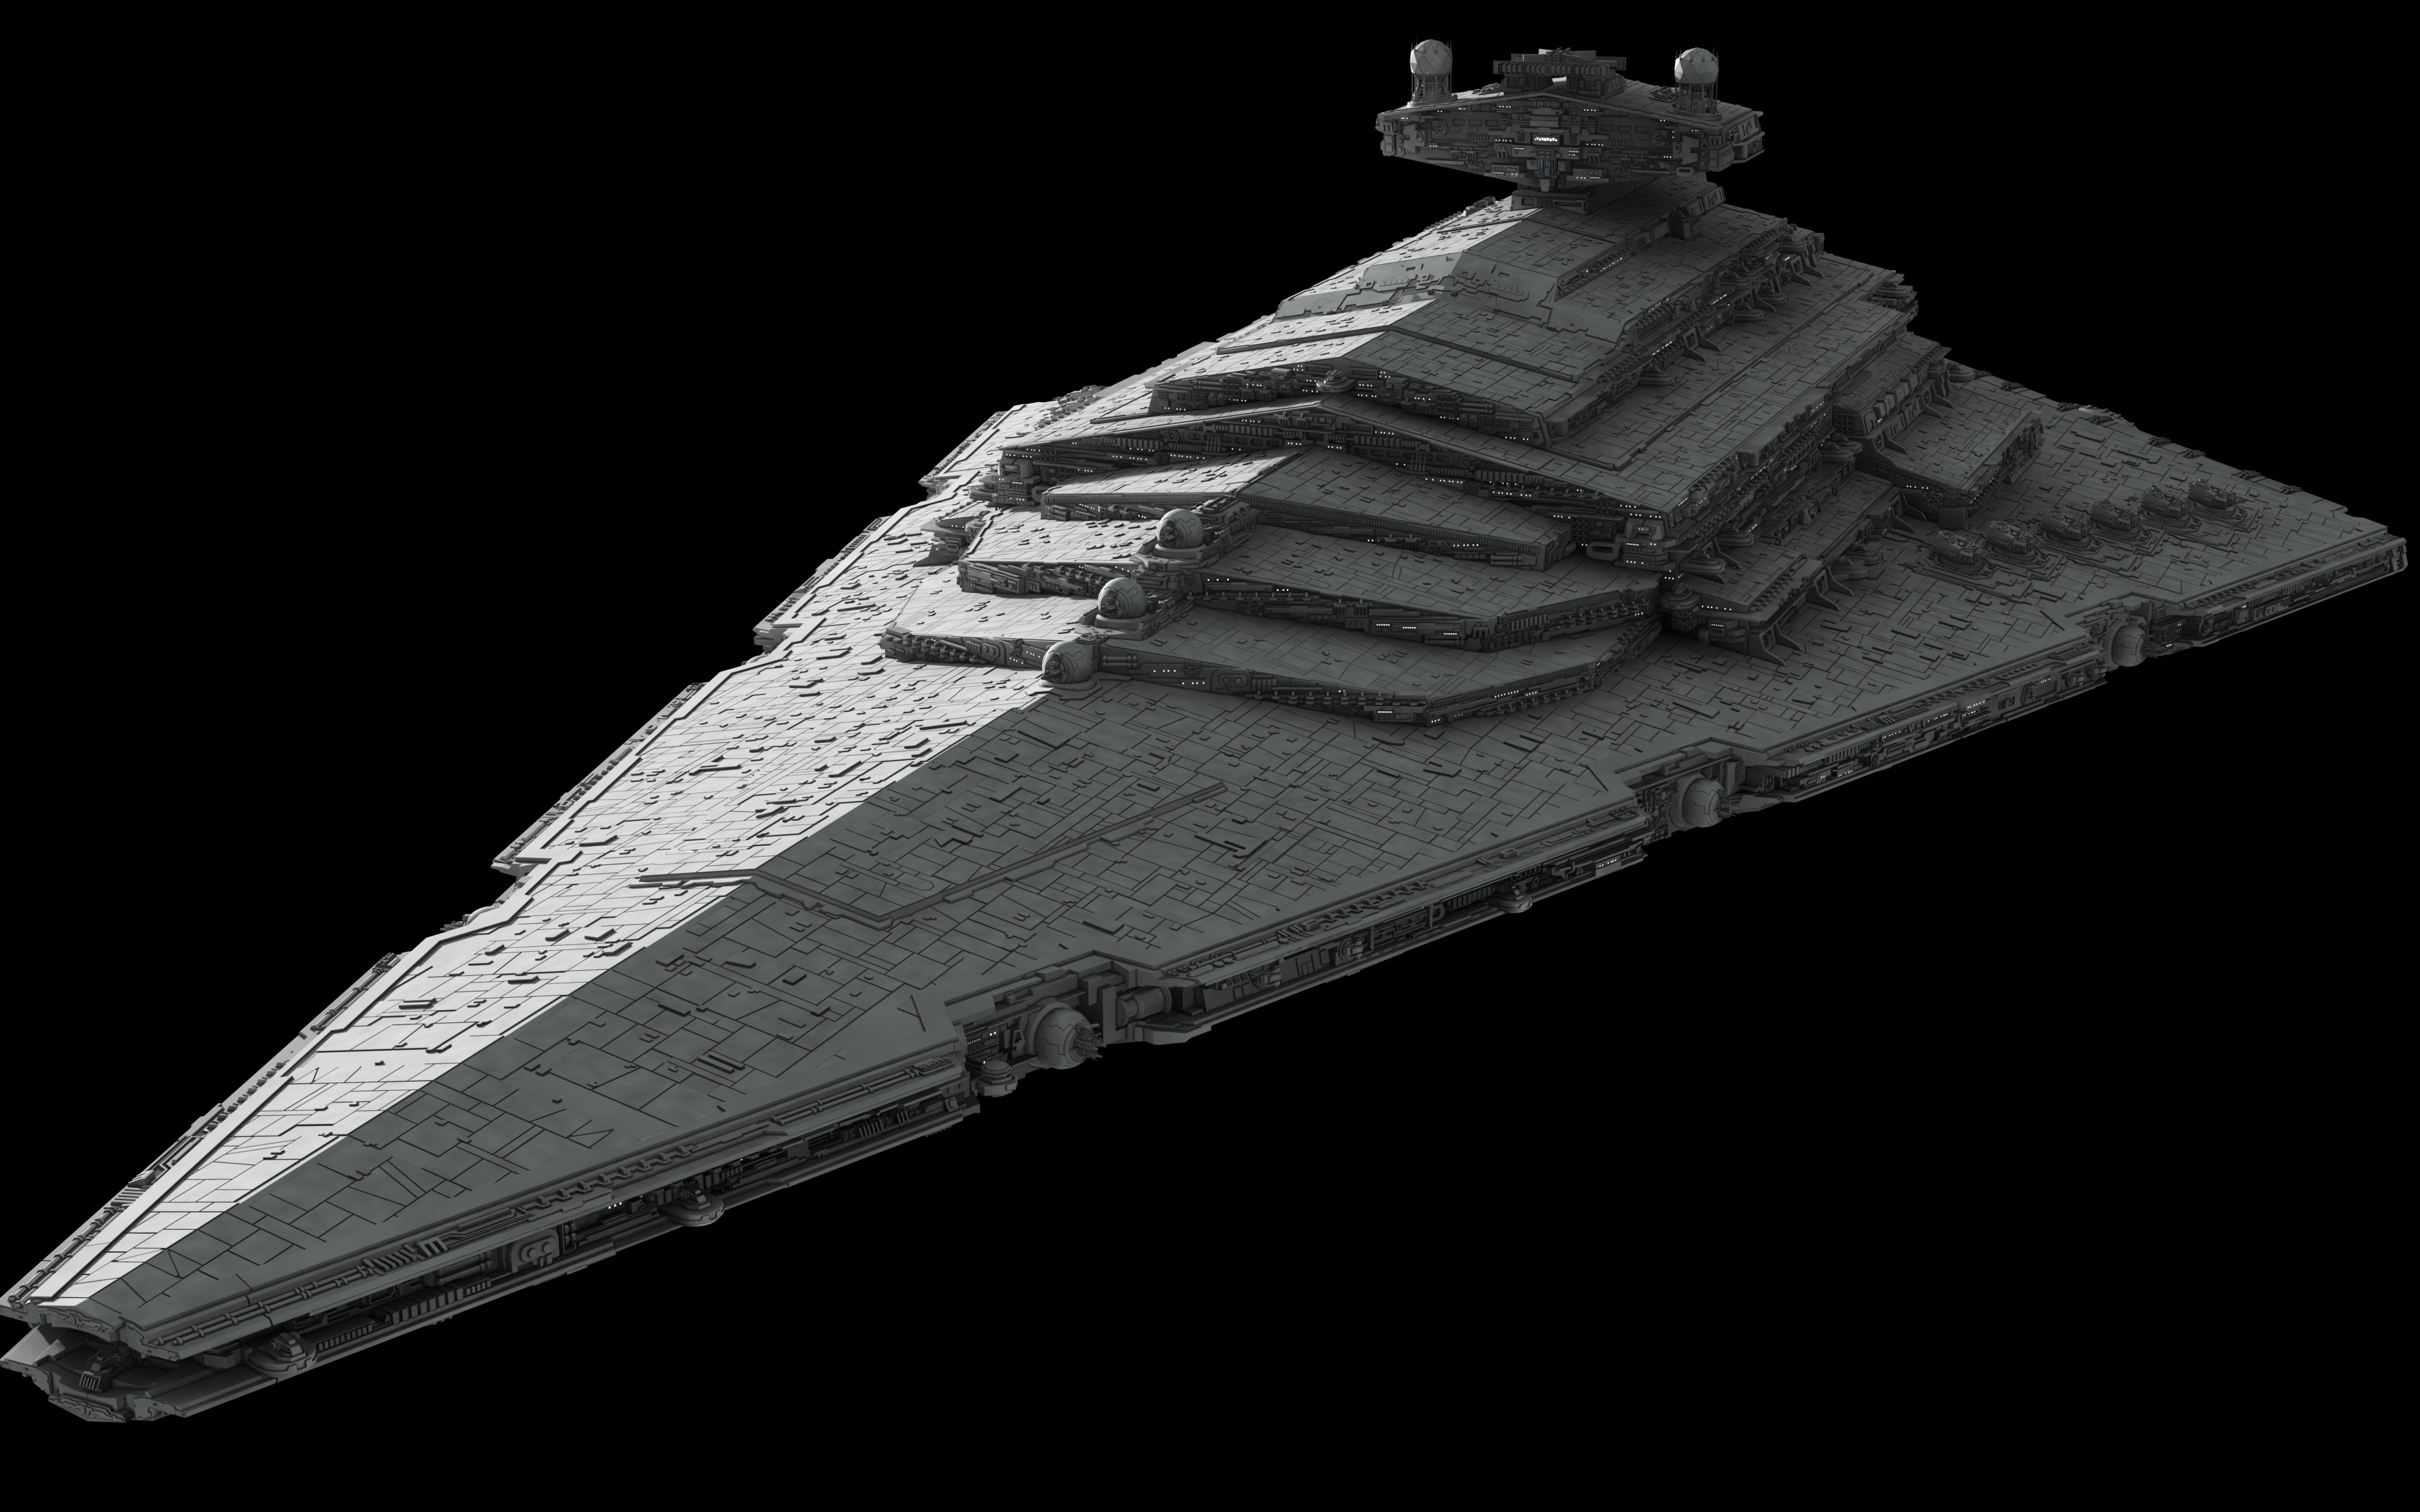 General 3840x2400 Star Wars render CGI Star Destroyer spaceship digital art Star Wars Ships Imperial Forces